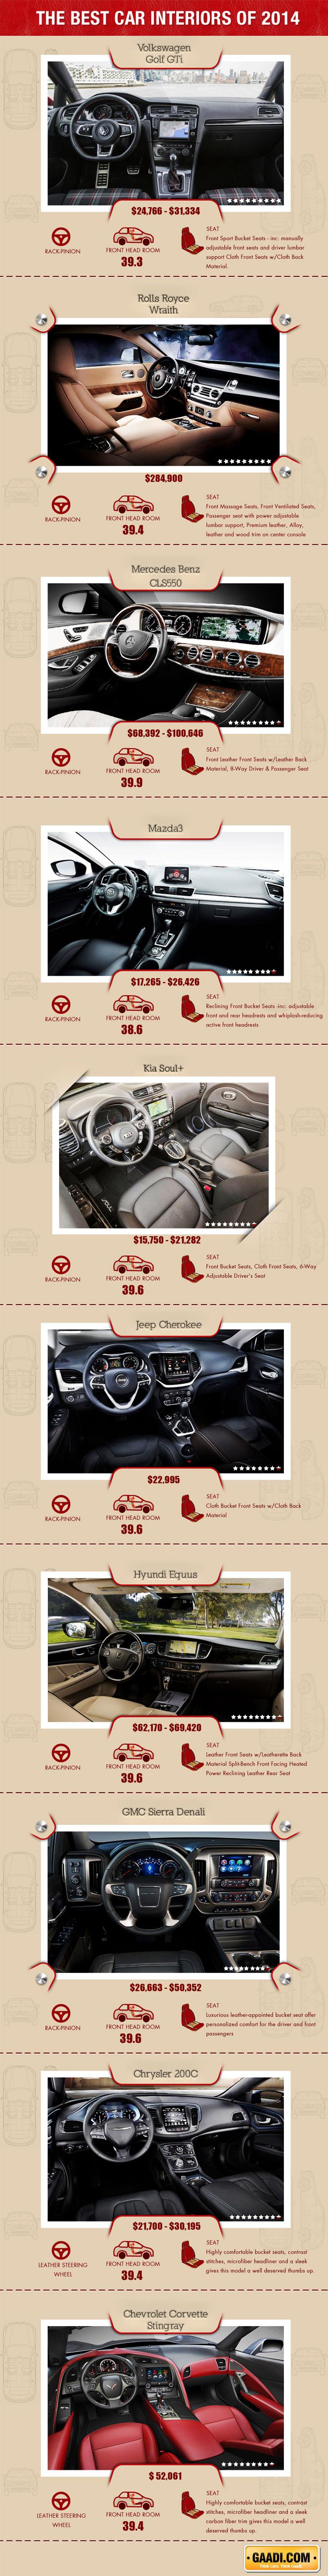 [Infographic] Best Car Interiors of 2014